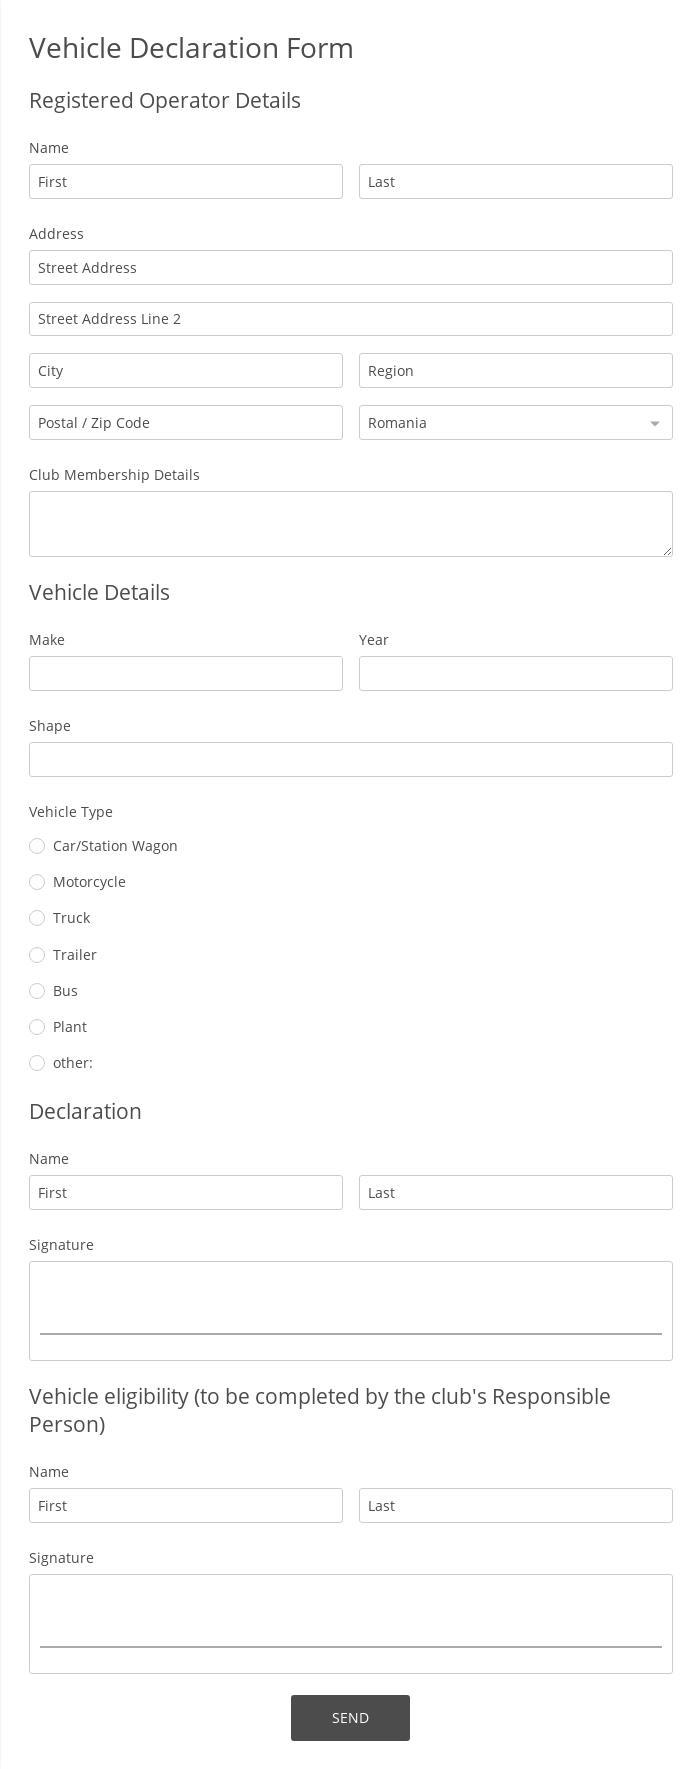 Vehicle Declaration Form